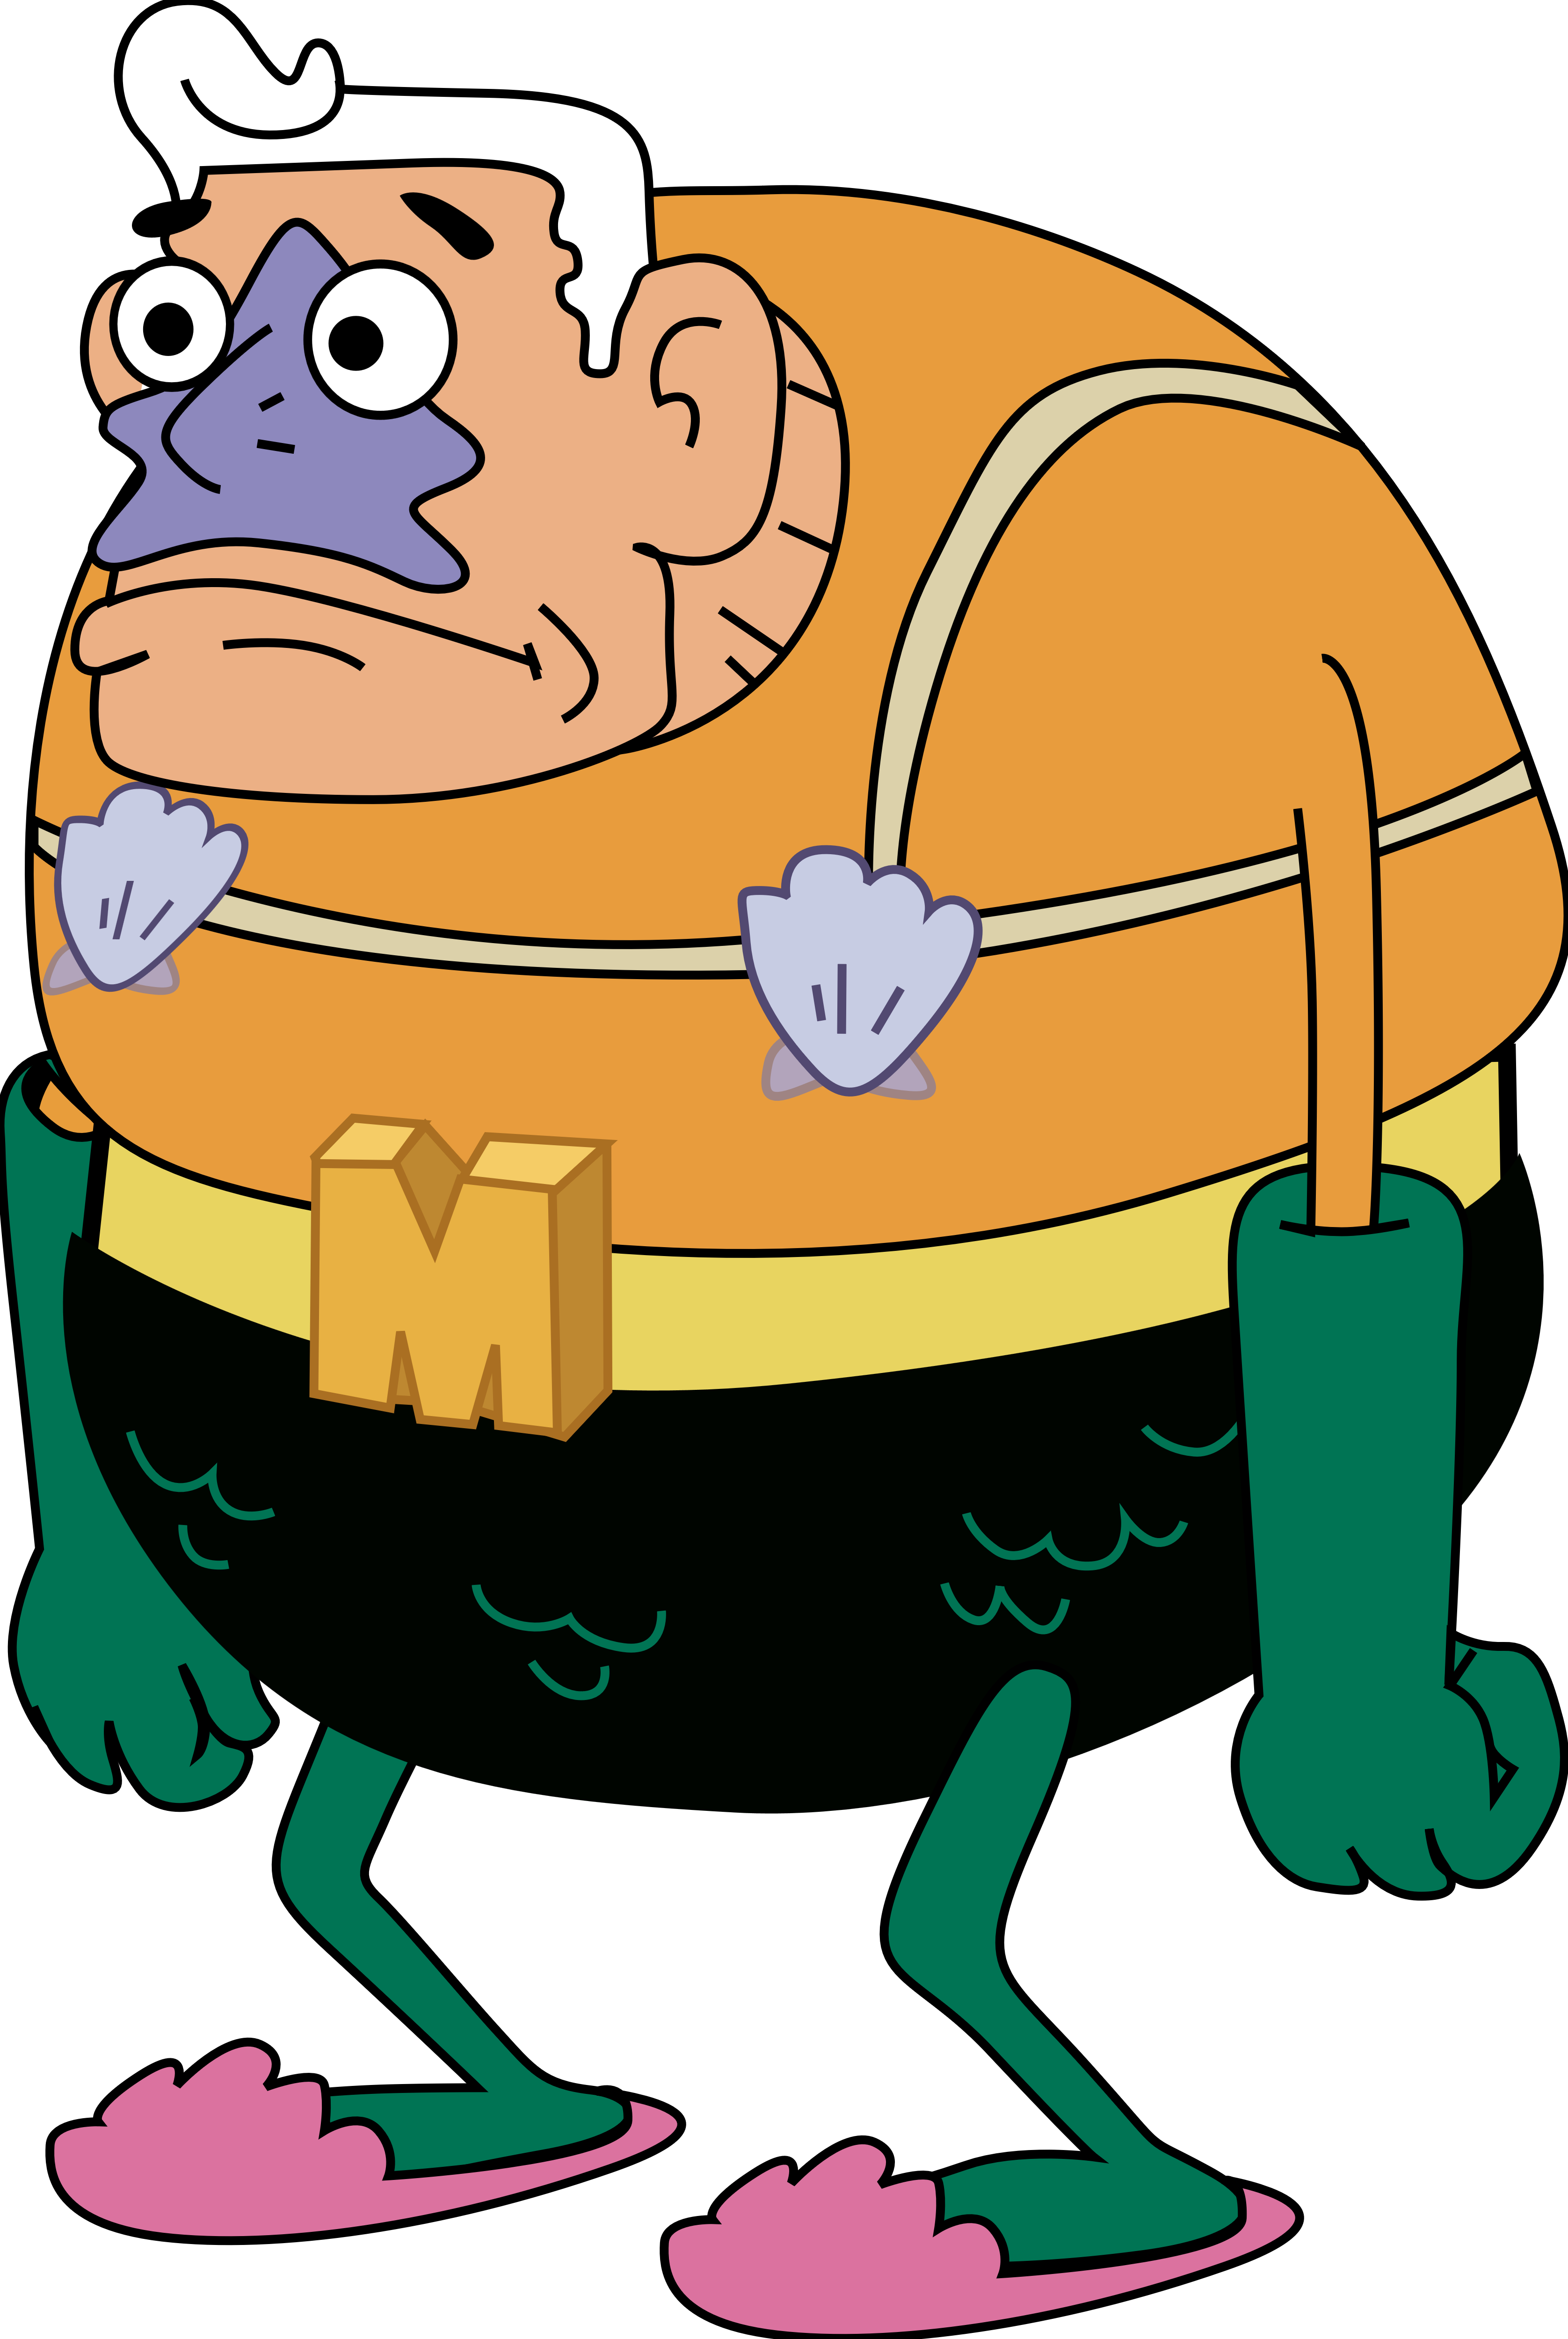 Cartoon Characters Getting High : Mermaid man logos download